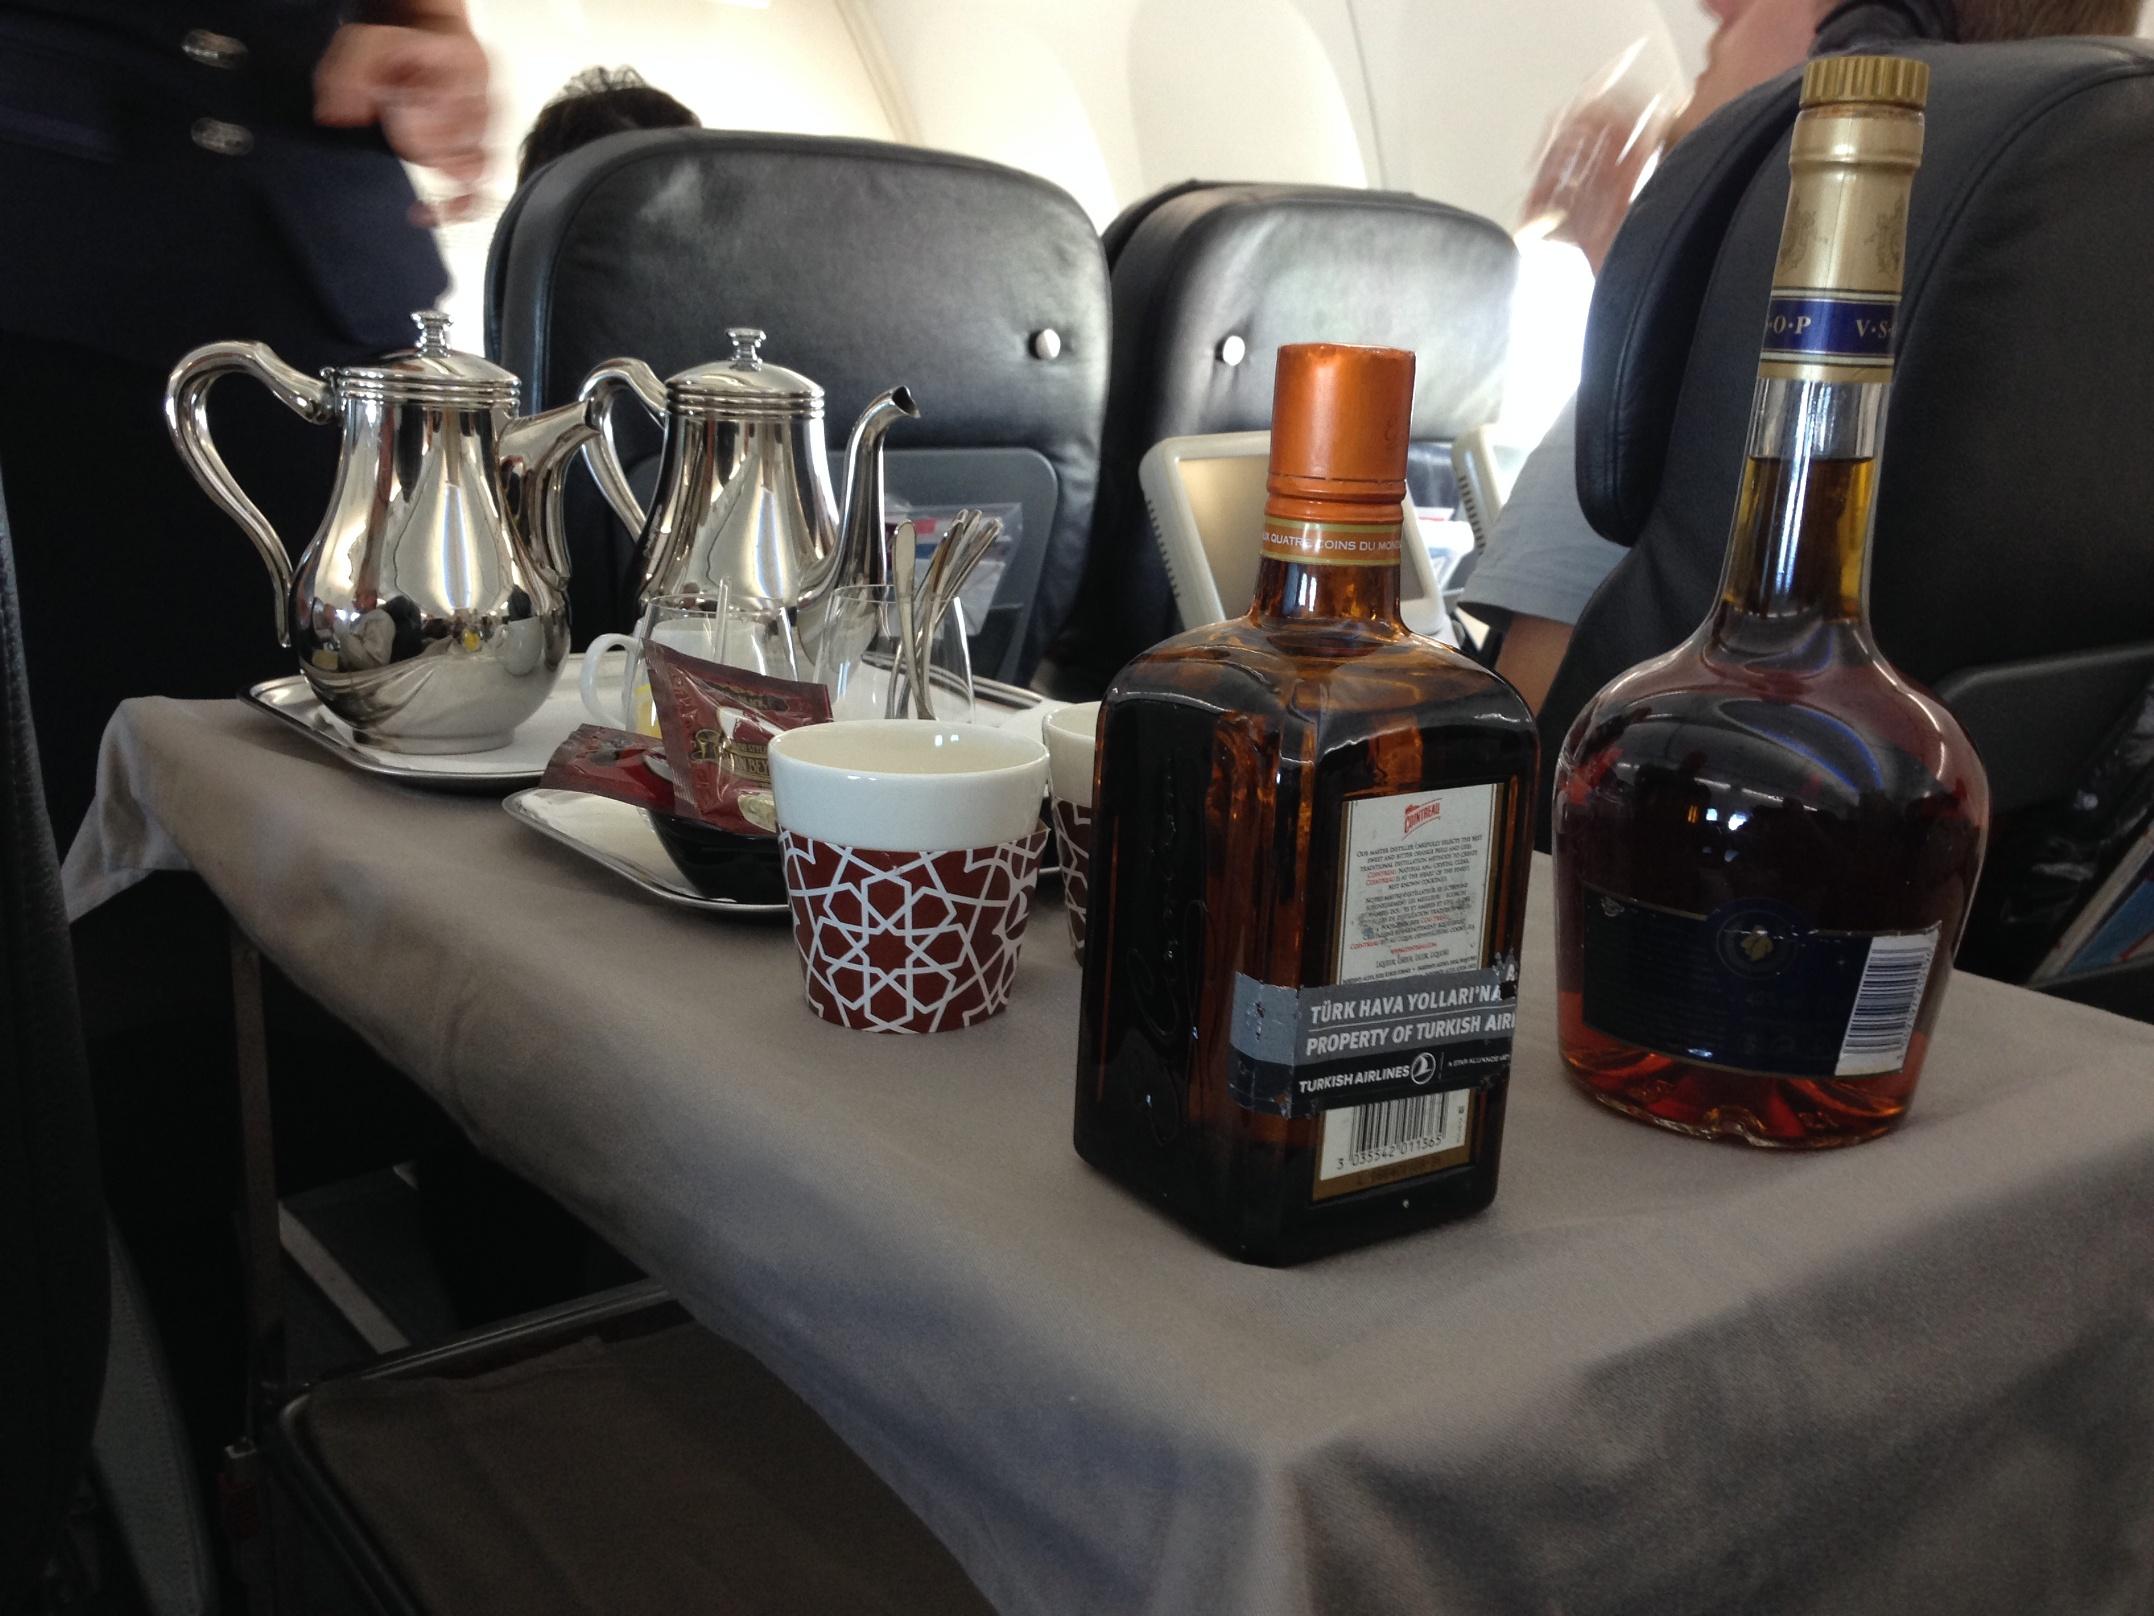 Turkish Airlines_inflight food_Istanbul Srajevo Business Class_2014-003